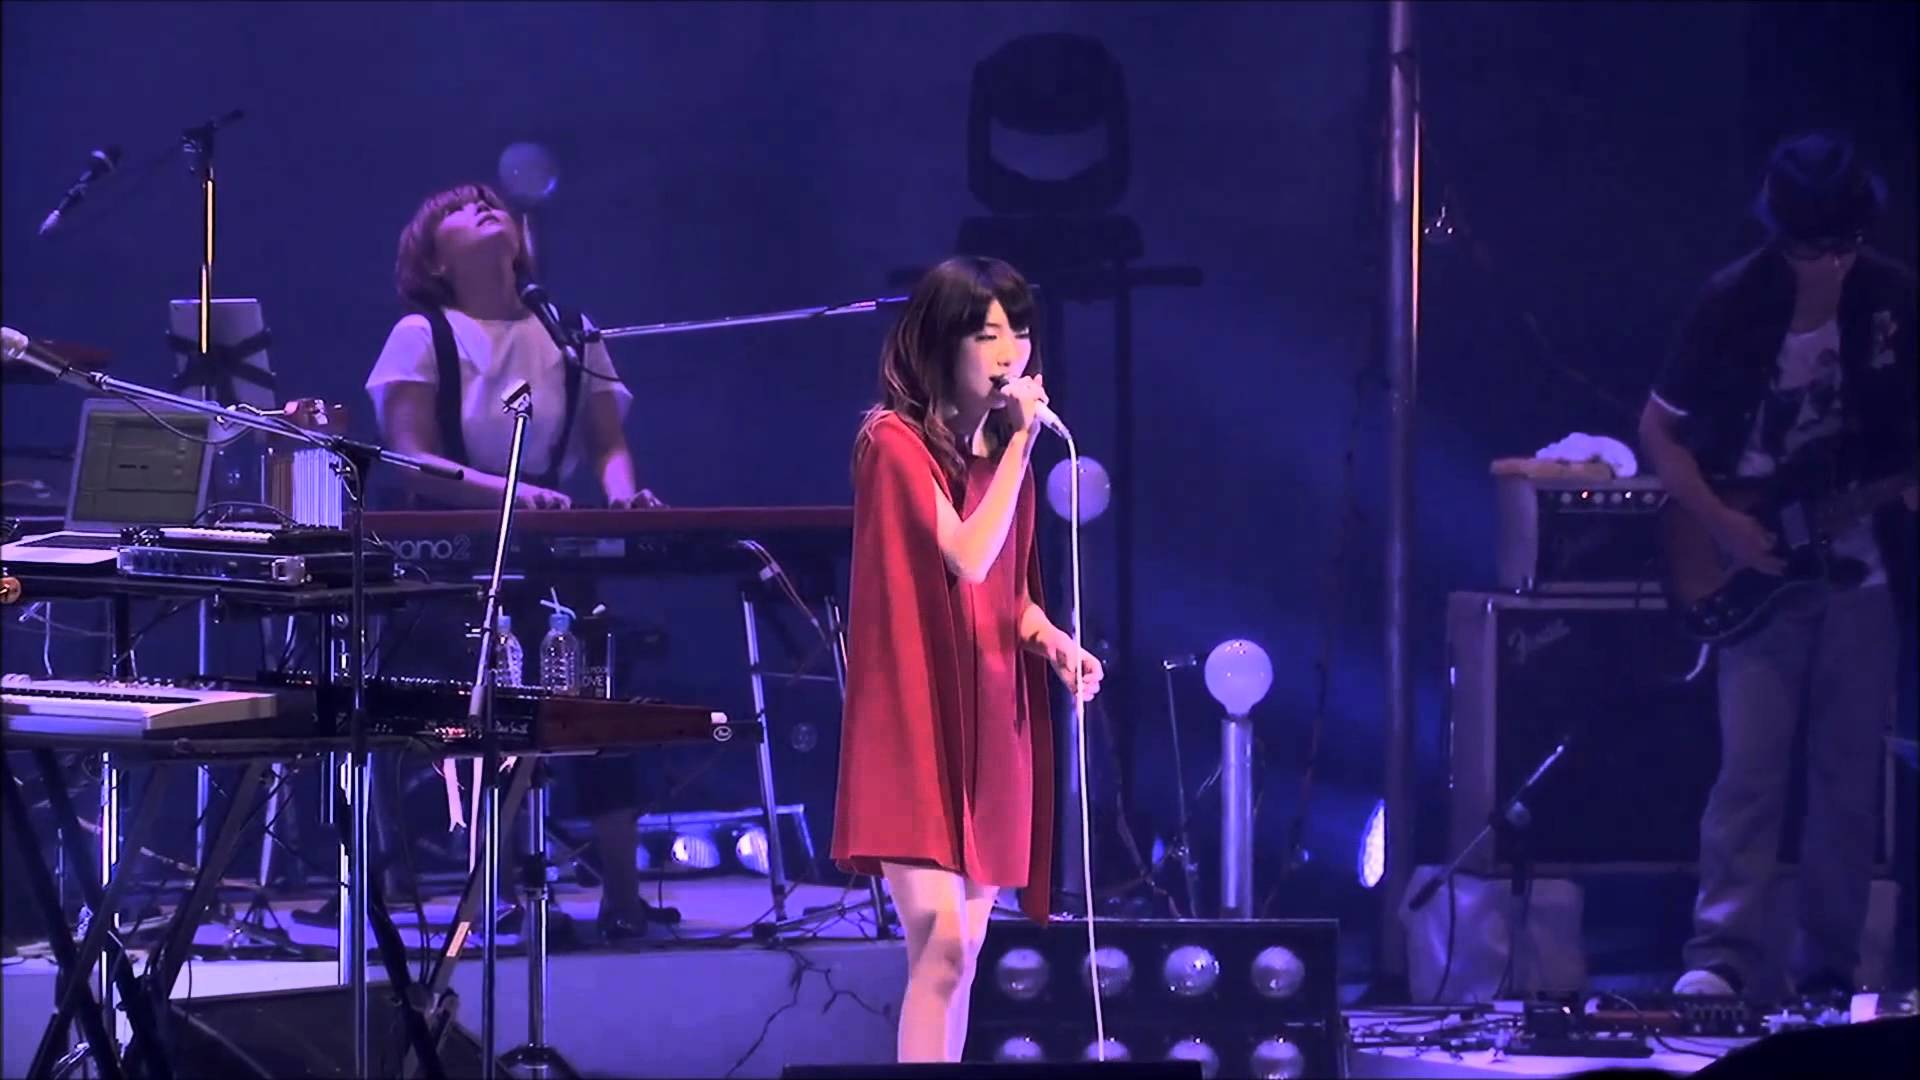 [Concert] moumoon FULLMOON LIVE SPECIAL 2014 ~ Chûshû no meigetsu ~ le 9 septembre au Nakano Sunplaza